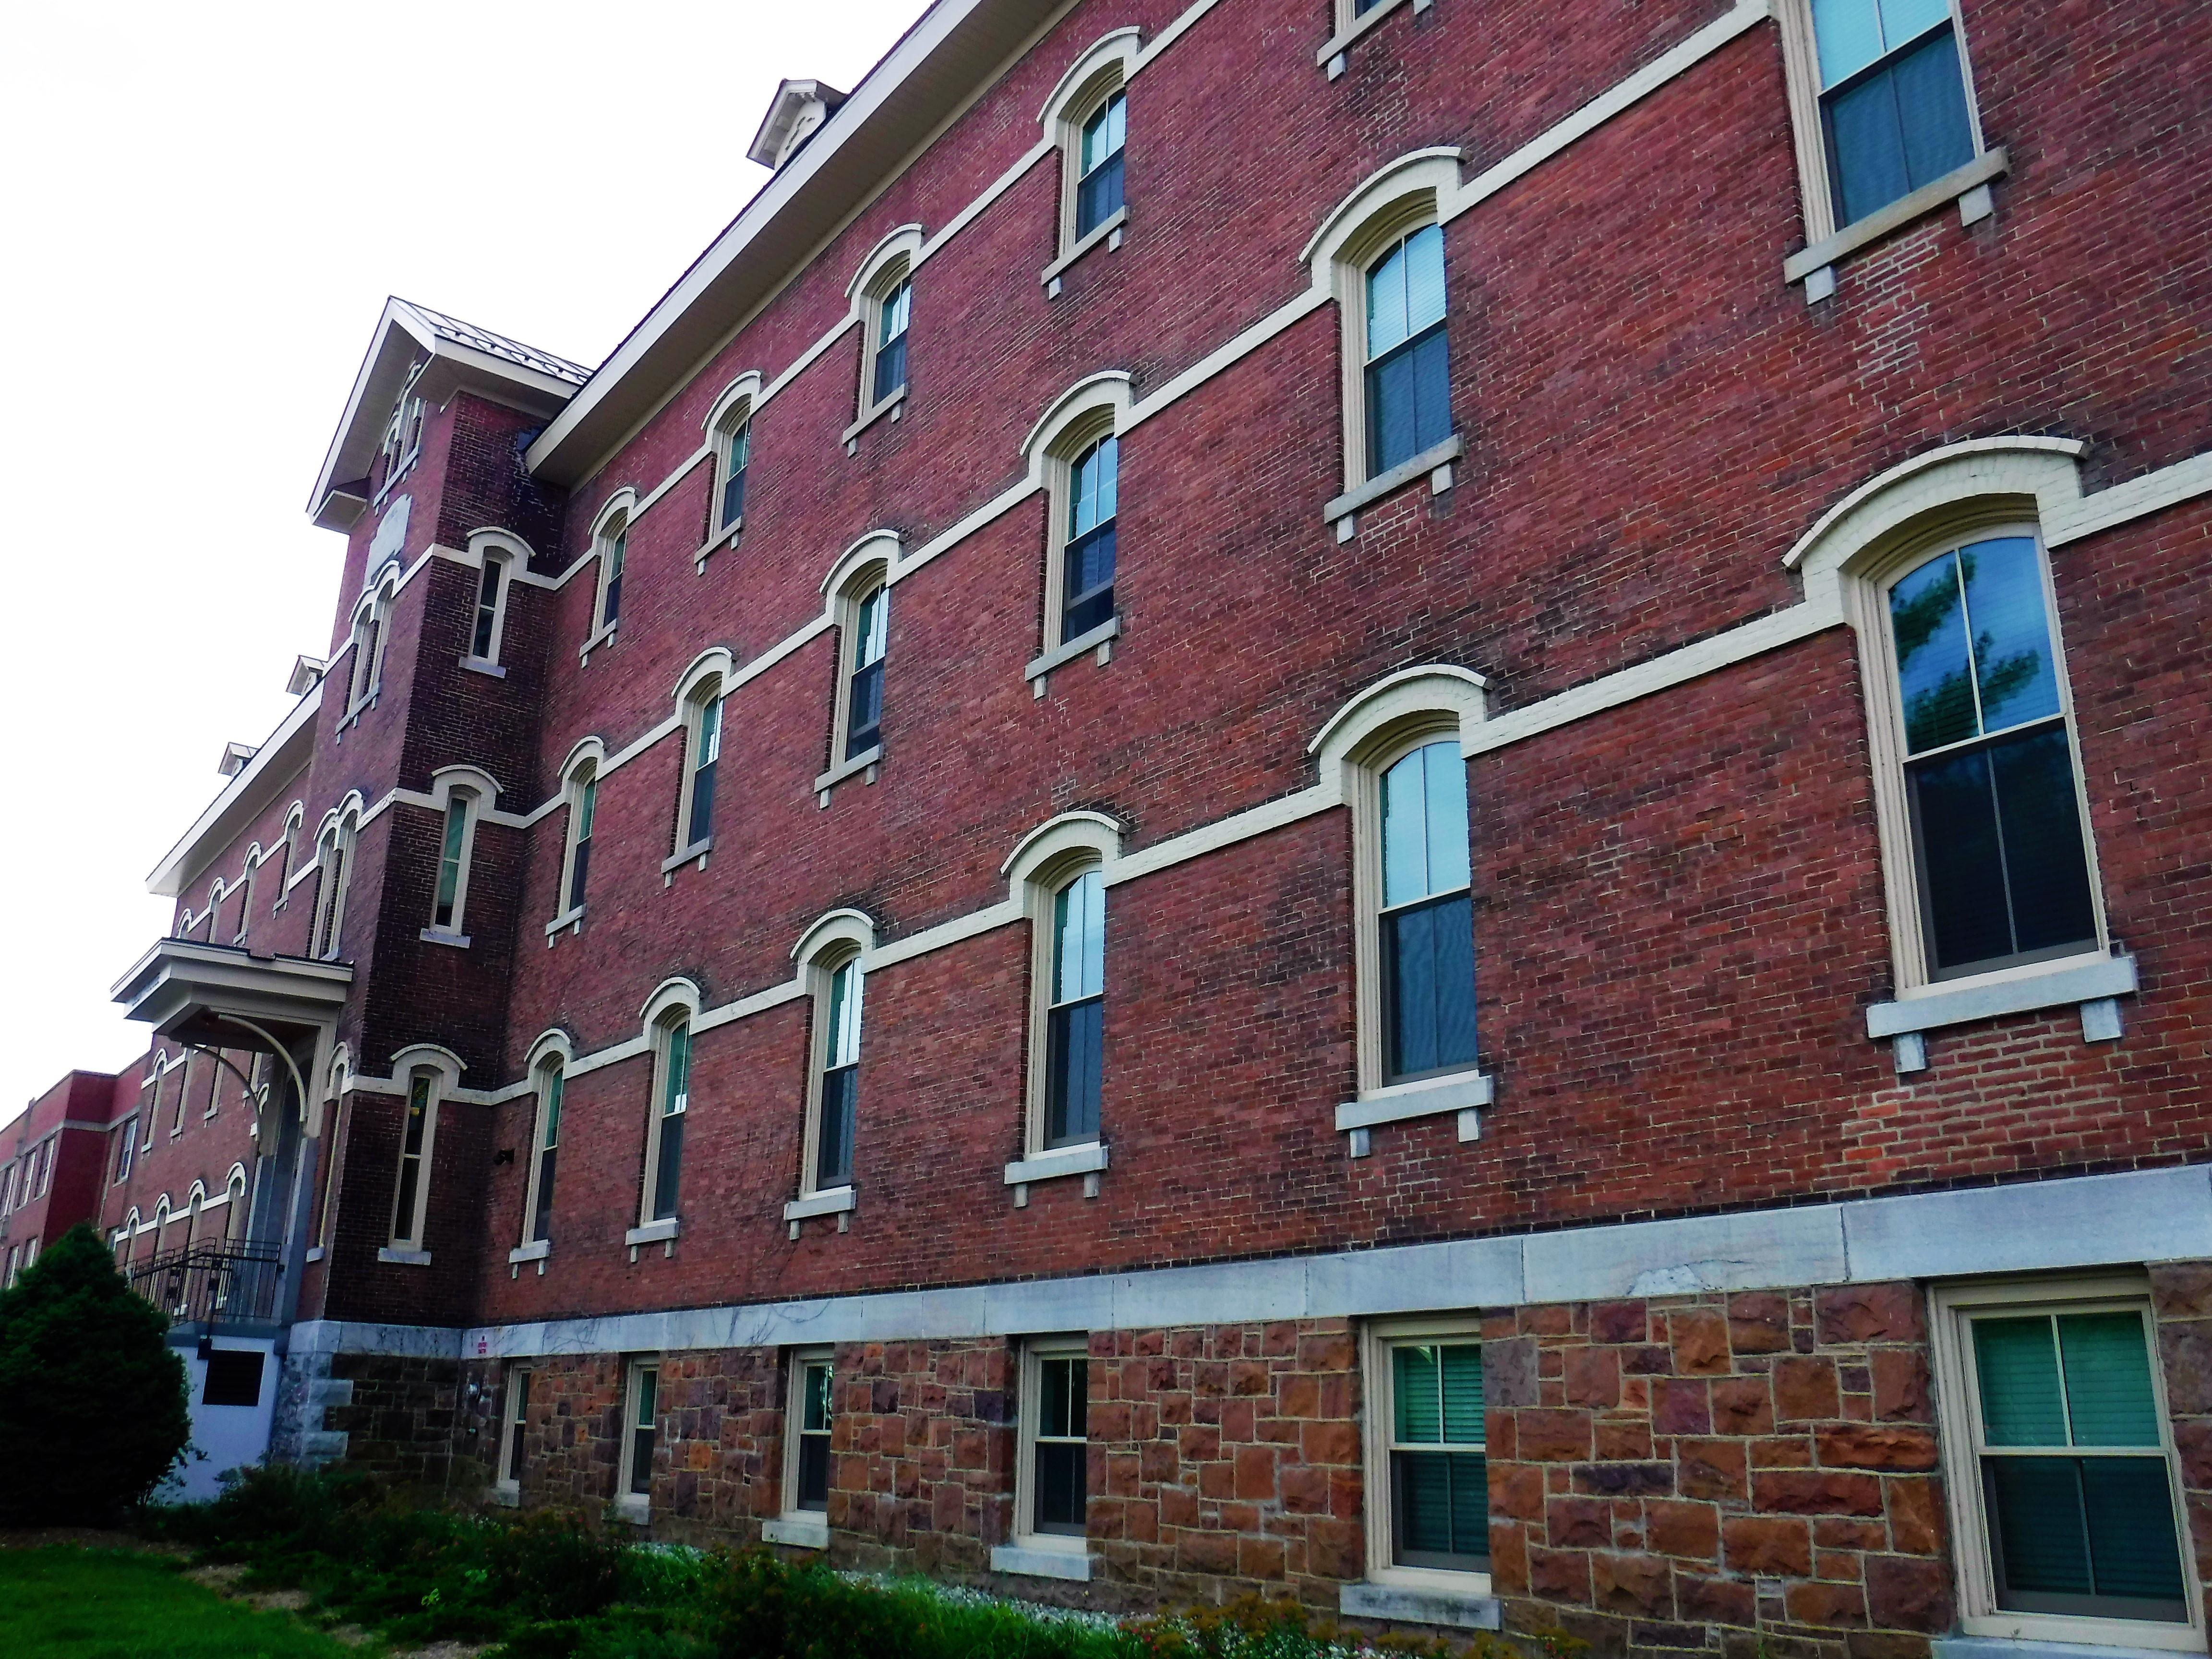 St. Joseph's Orphanage